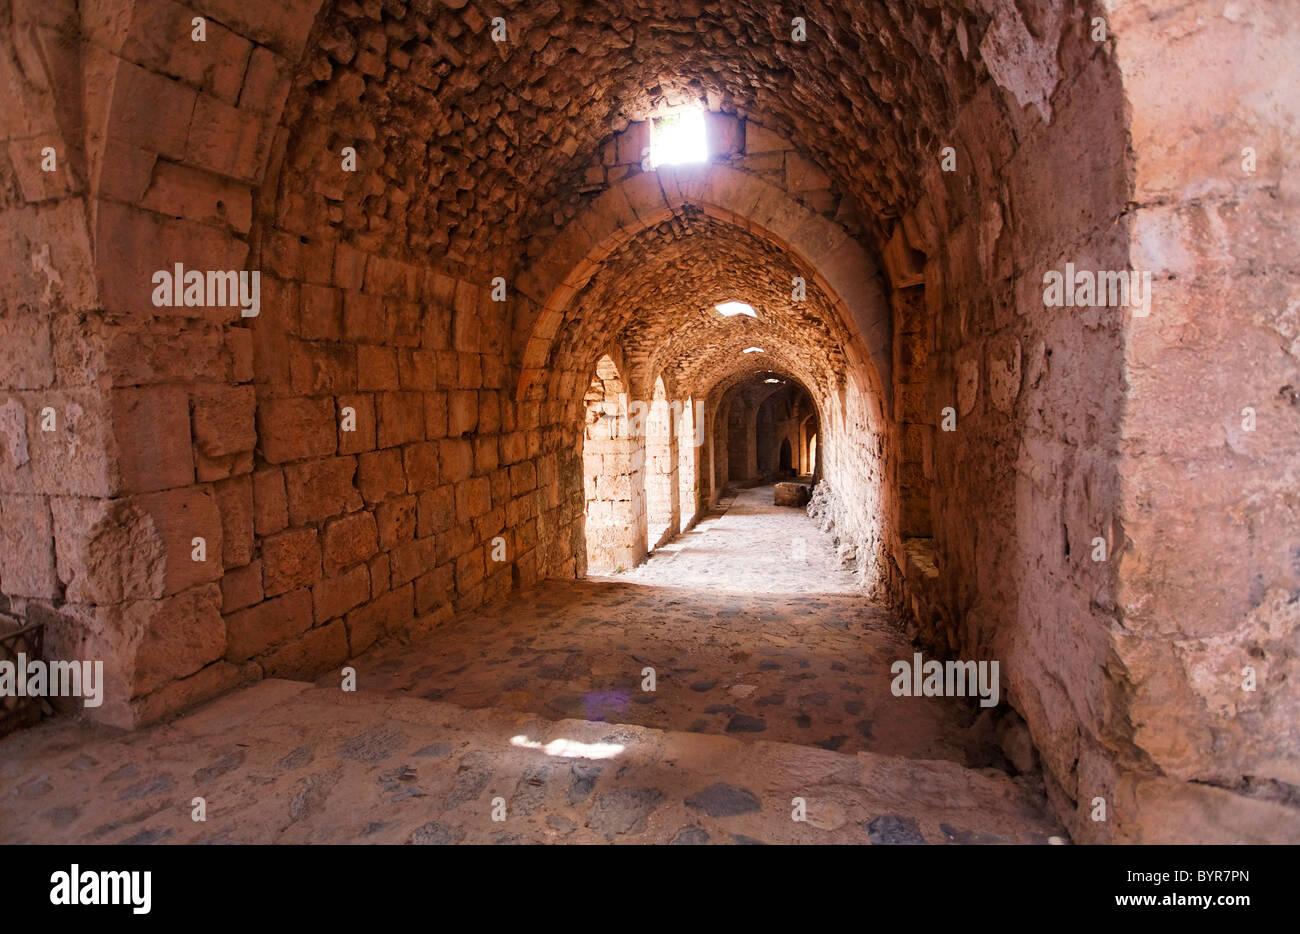 Inside the crusader castle of Krak Des Chevaliers, Syria - Stock Image